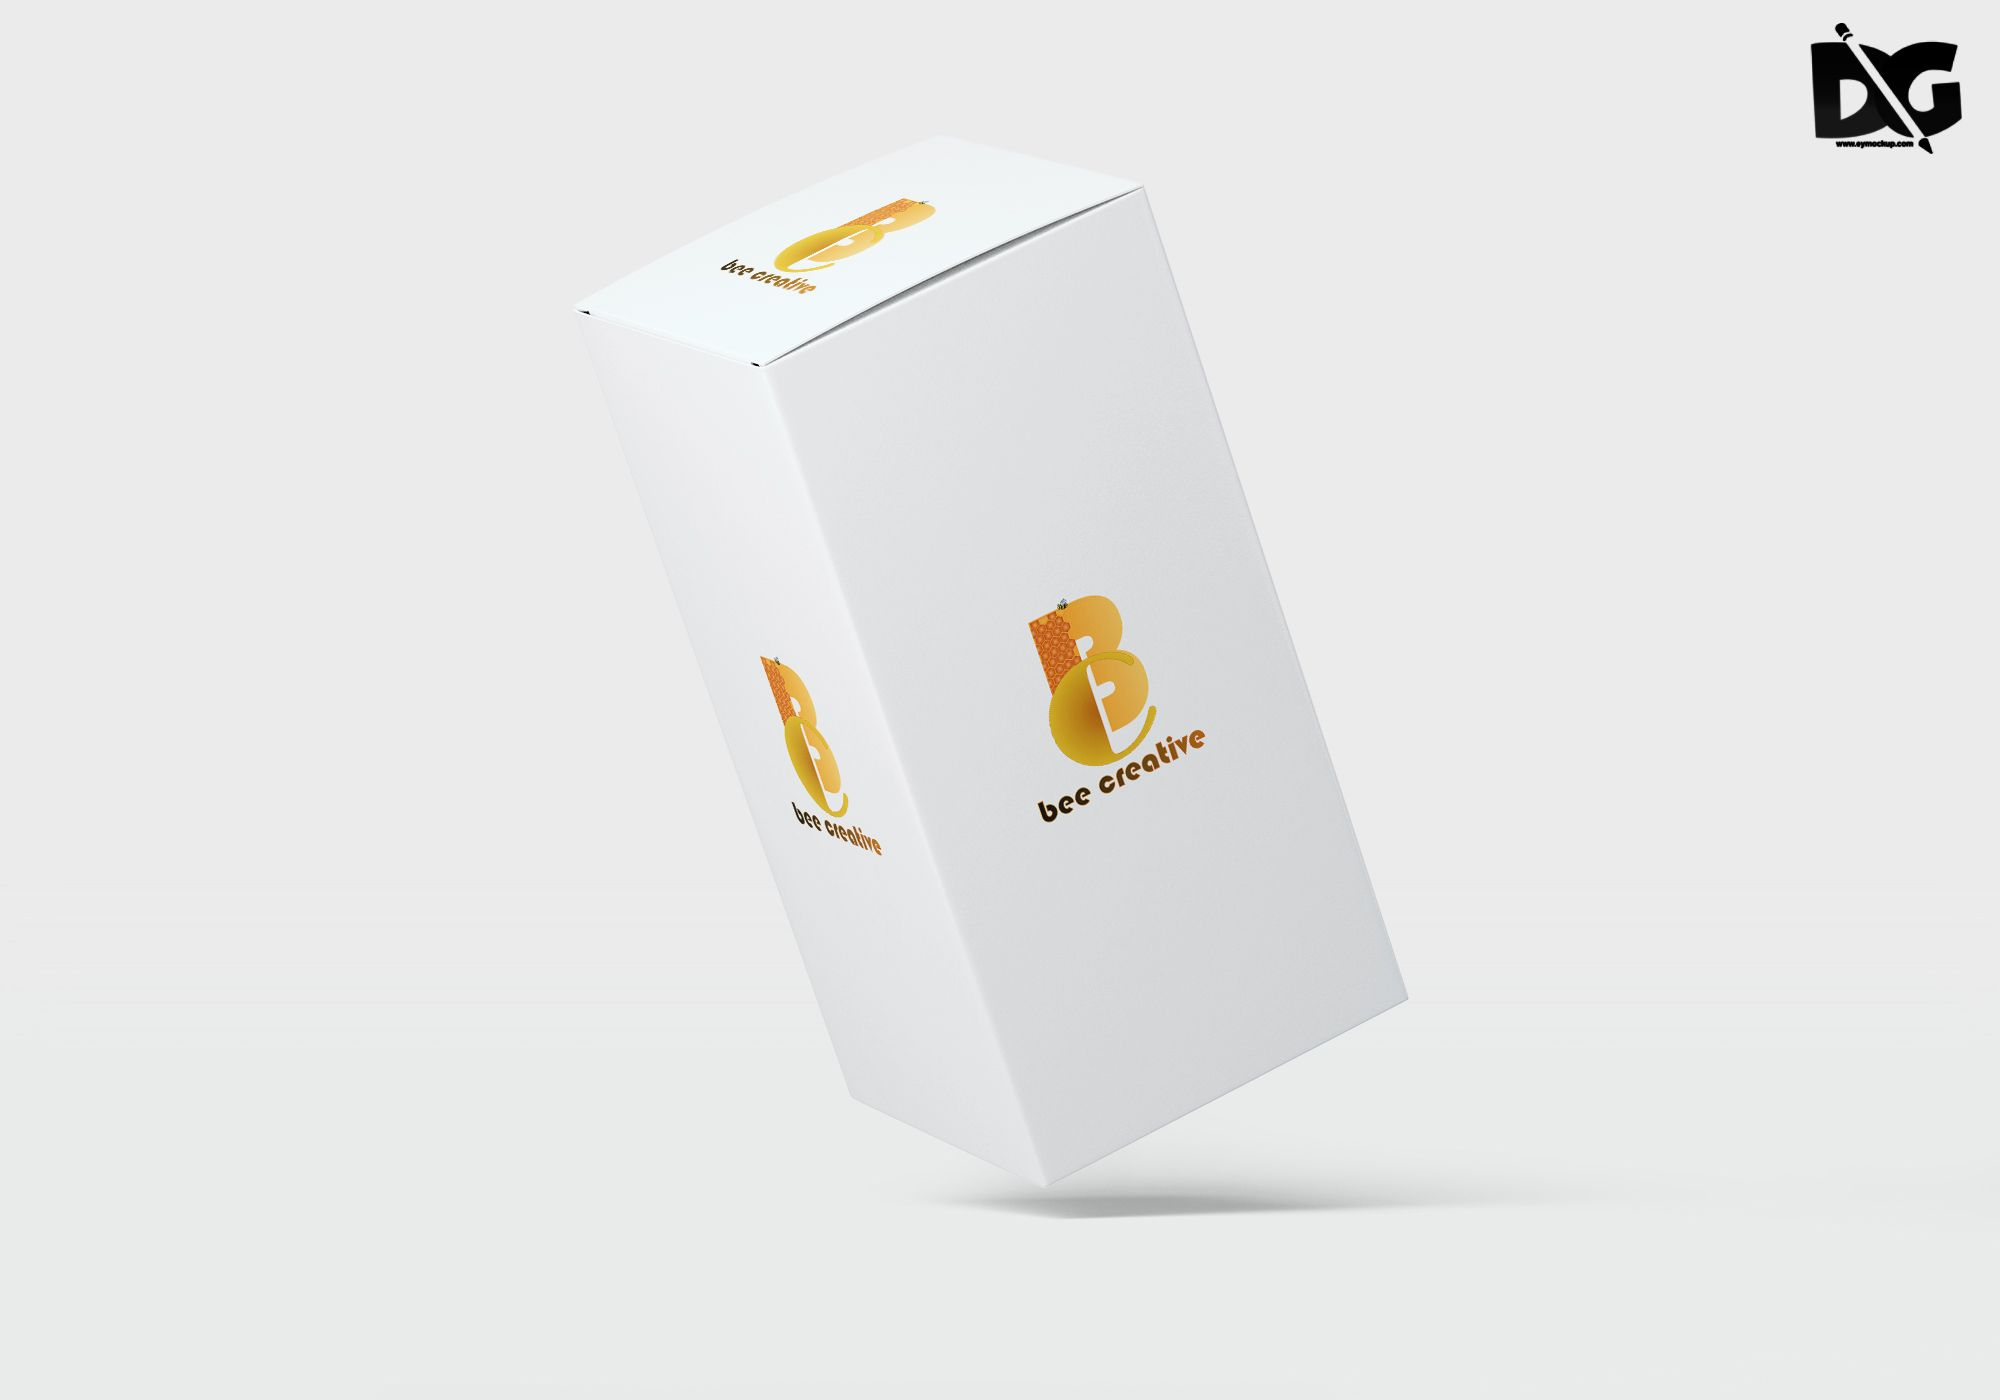 Download Open Big Tilt Acrylic Box Mockup Boxmockup Branding Download Downloadmockup Downloadpsd Free Freemockup Freepsd Box Mockup Acrylic Box Mockup Free Psd